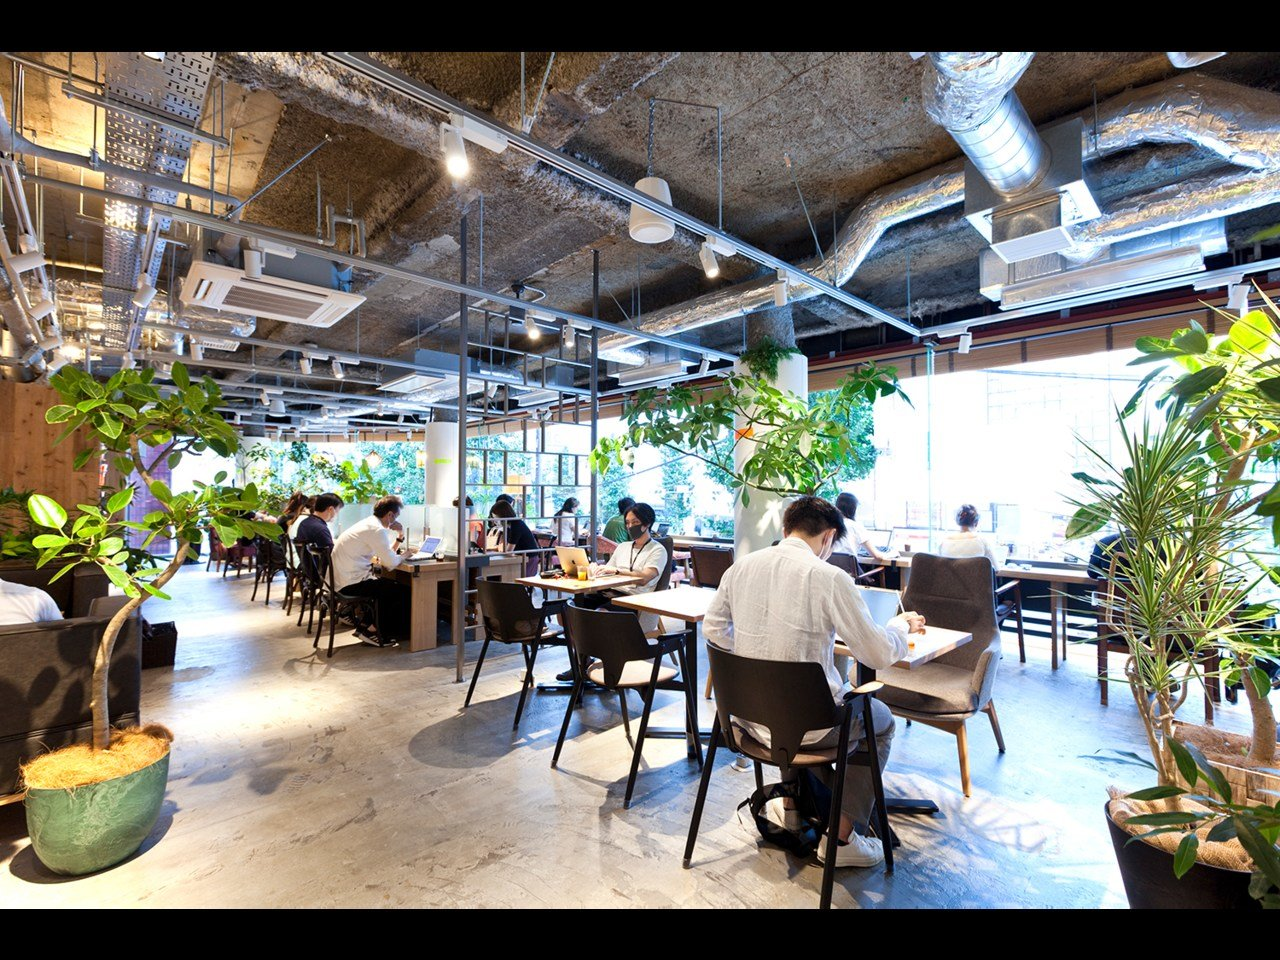 『TSUTAYA田町駅前店』が7月末にリニューアルオープン!